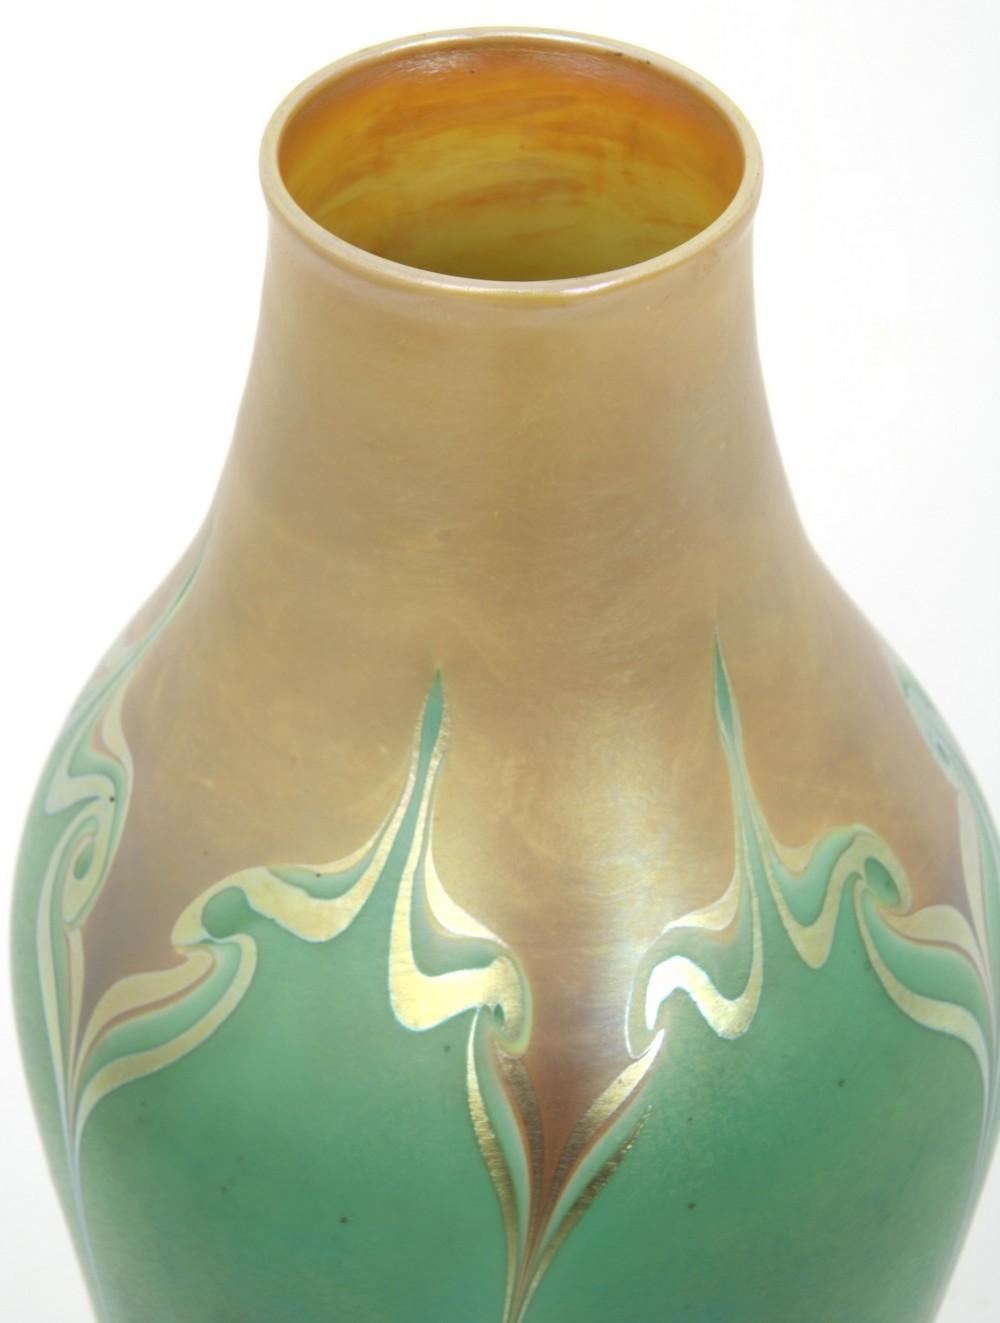 Rare Trevaise Decorated Art Glass Vase